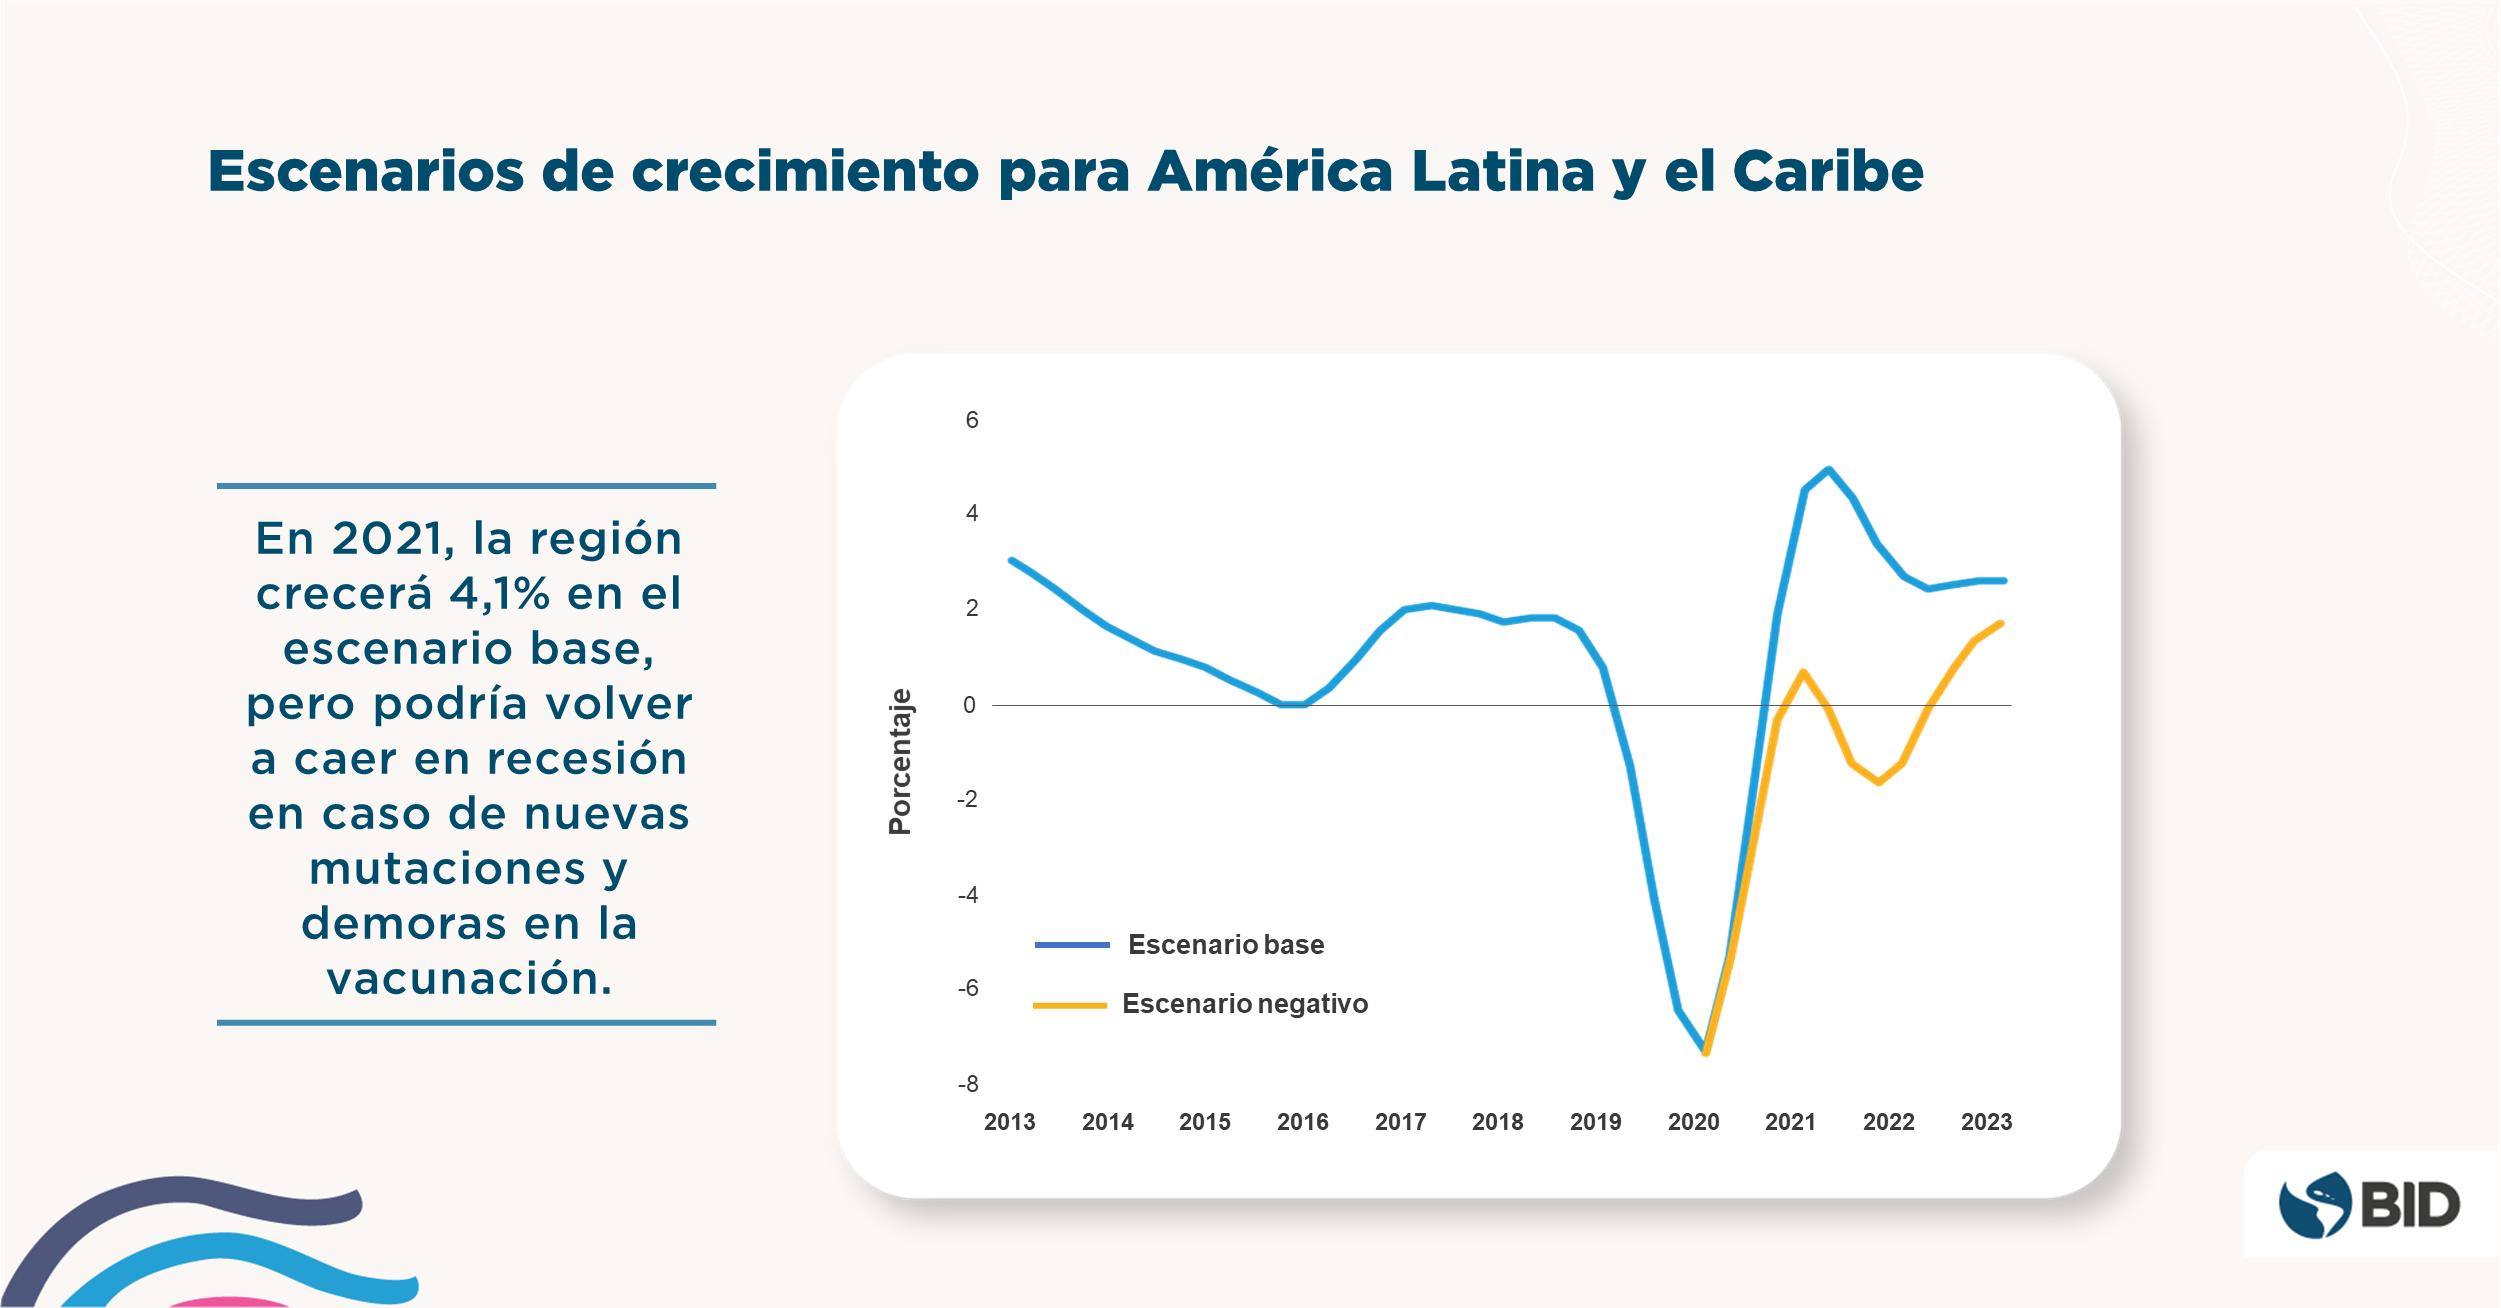 Informe Macroeconomico America Latina Caribe 2021 - Escenario negativo